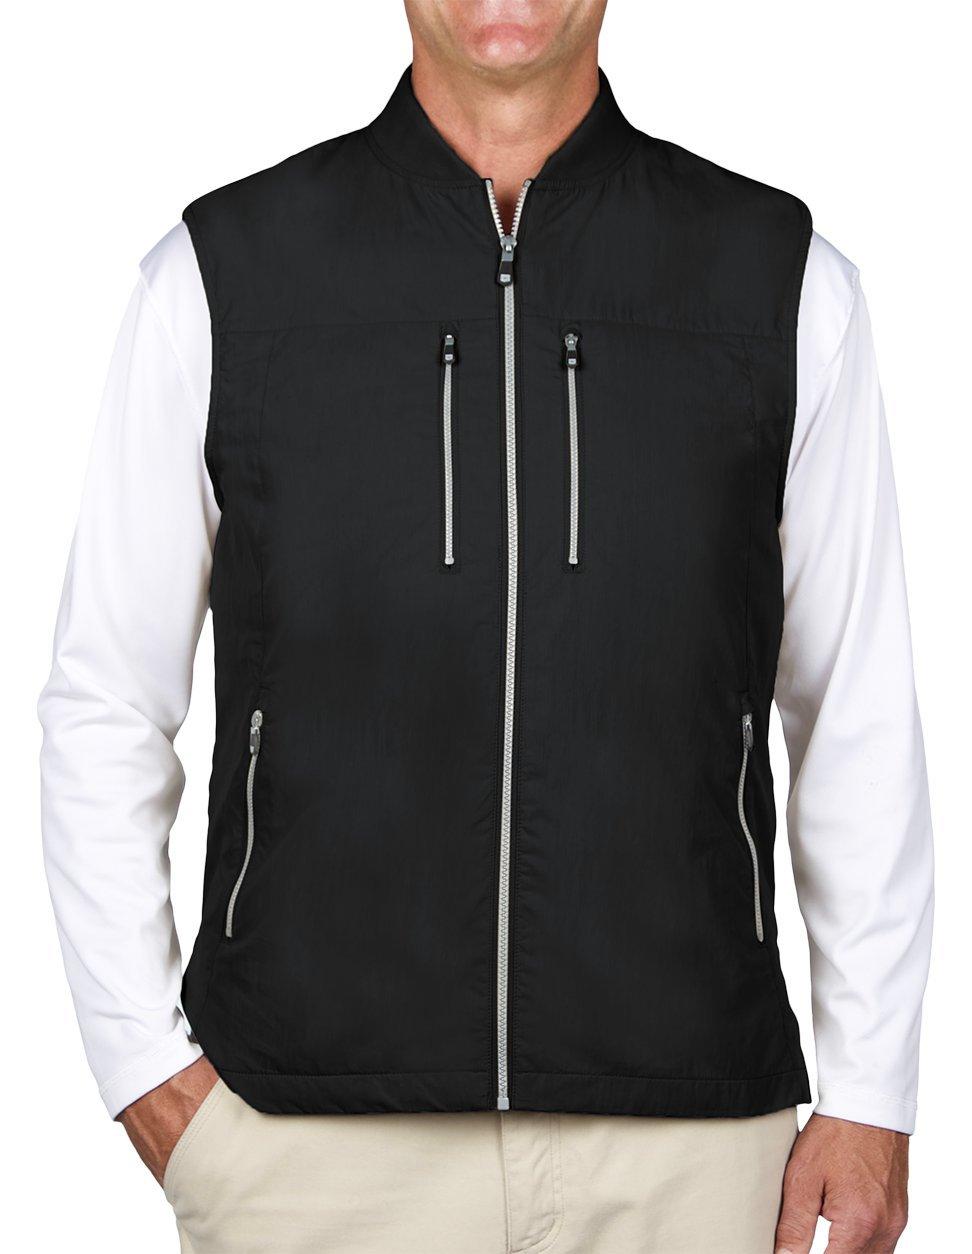 SCOTTeVEST 101 Vest-Men's - 9 Pockets, Travel Clothing, BLK, S by SCOTTeVEST